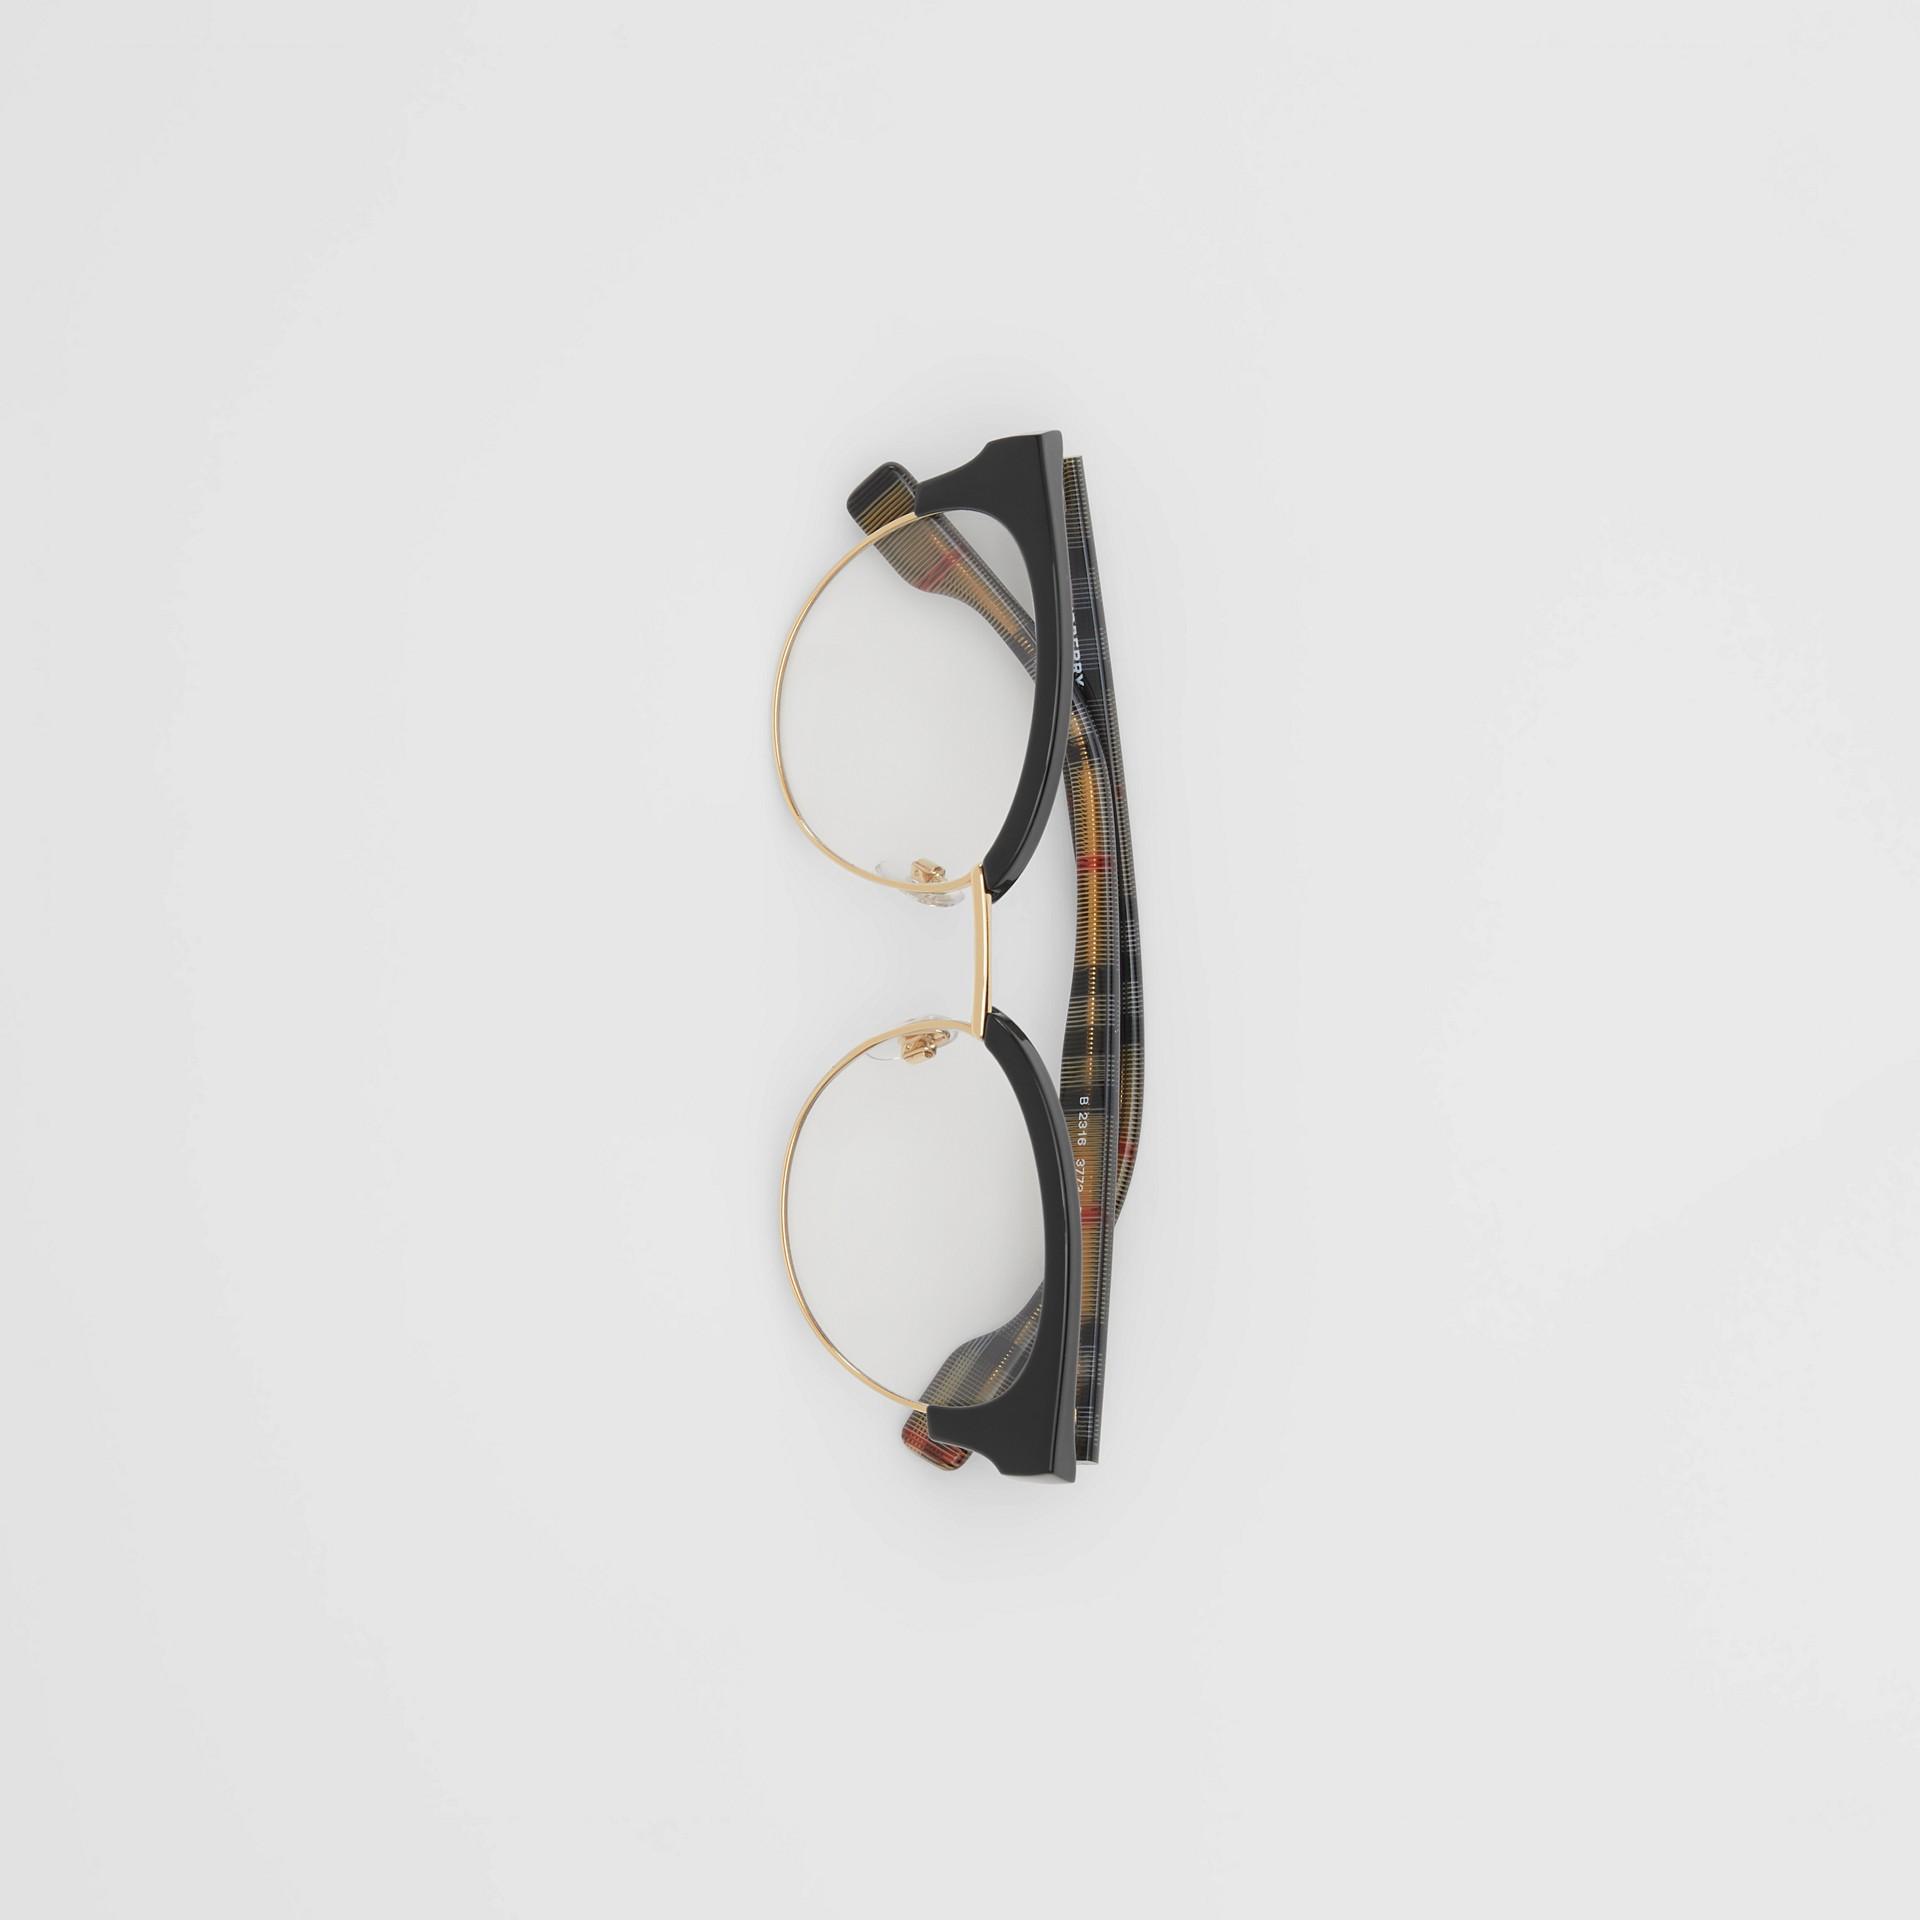 Cat-eye Optical Frames in Black/beige - Women | Burberry Australia - gallery image 3